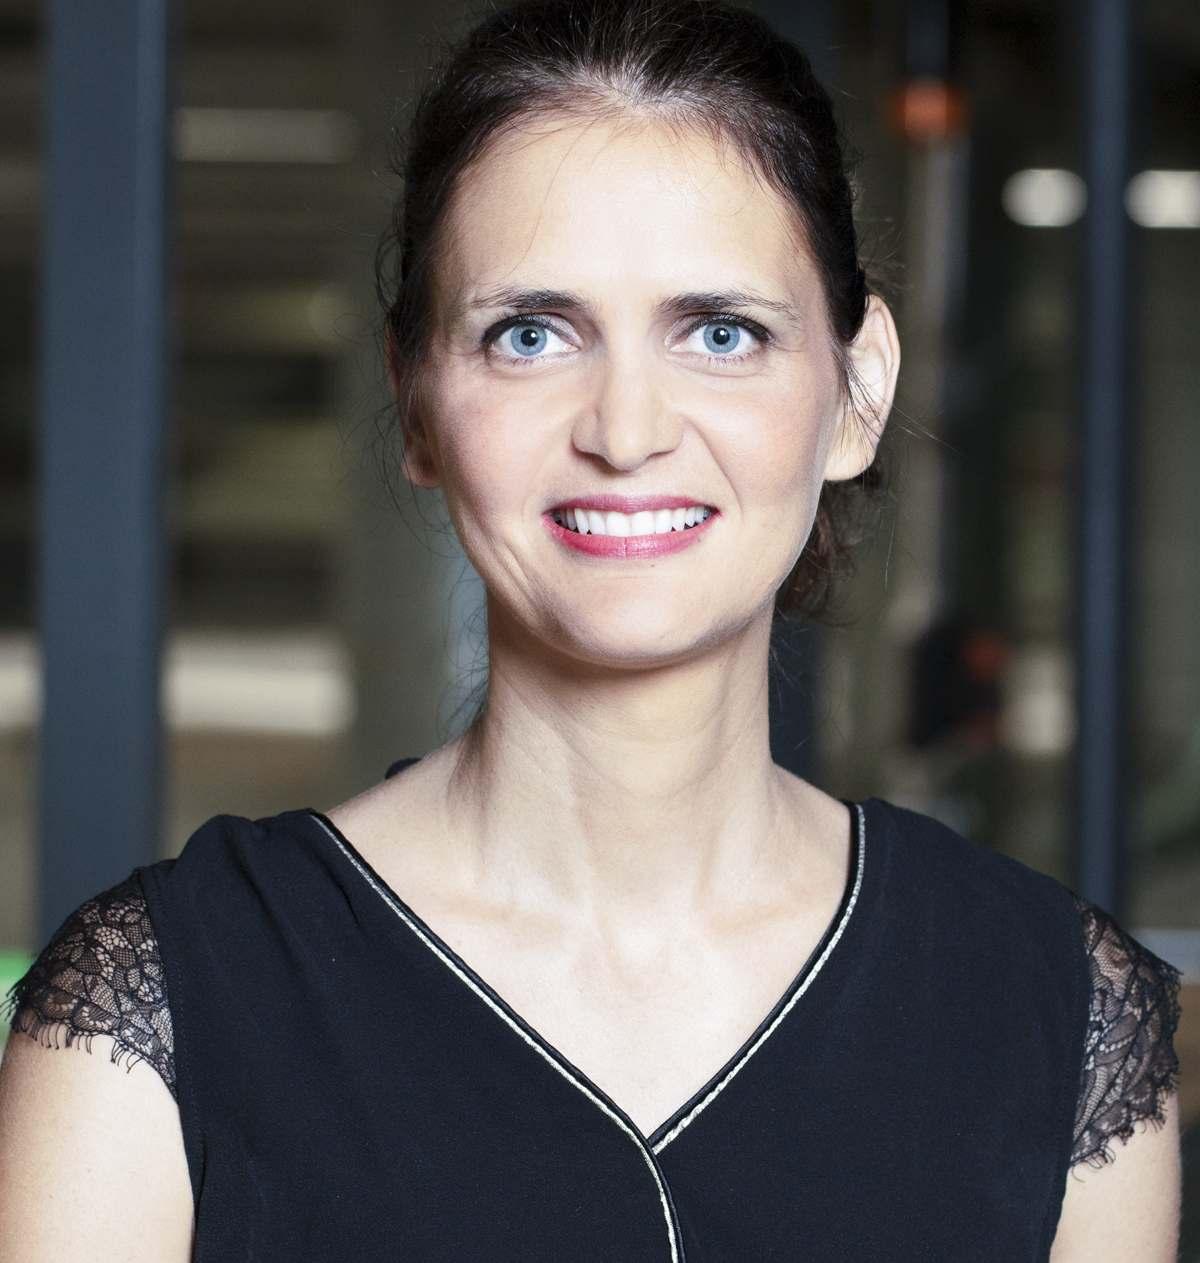 Сара Вуйтине, Мениджър на Фабрика за шоколадови продукти и бисквити, Нестле България